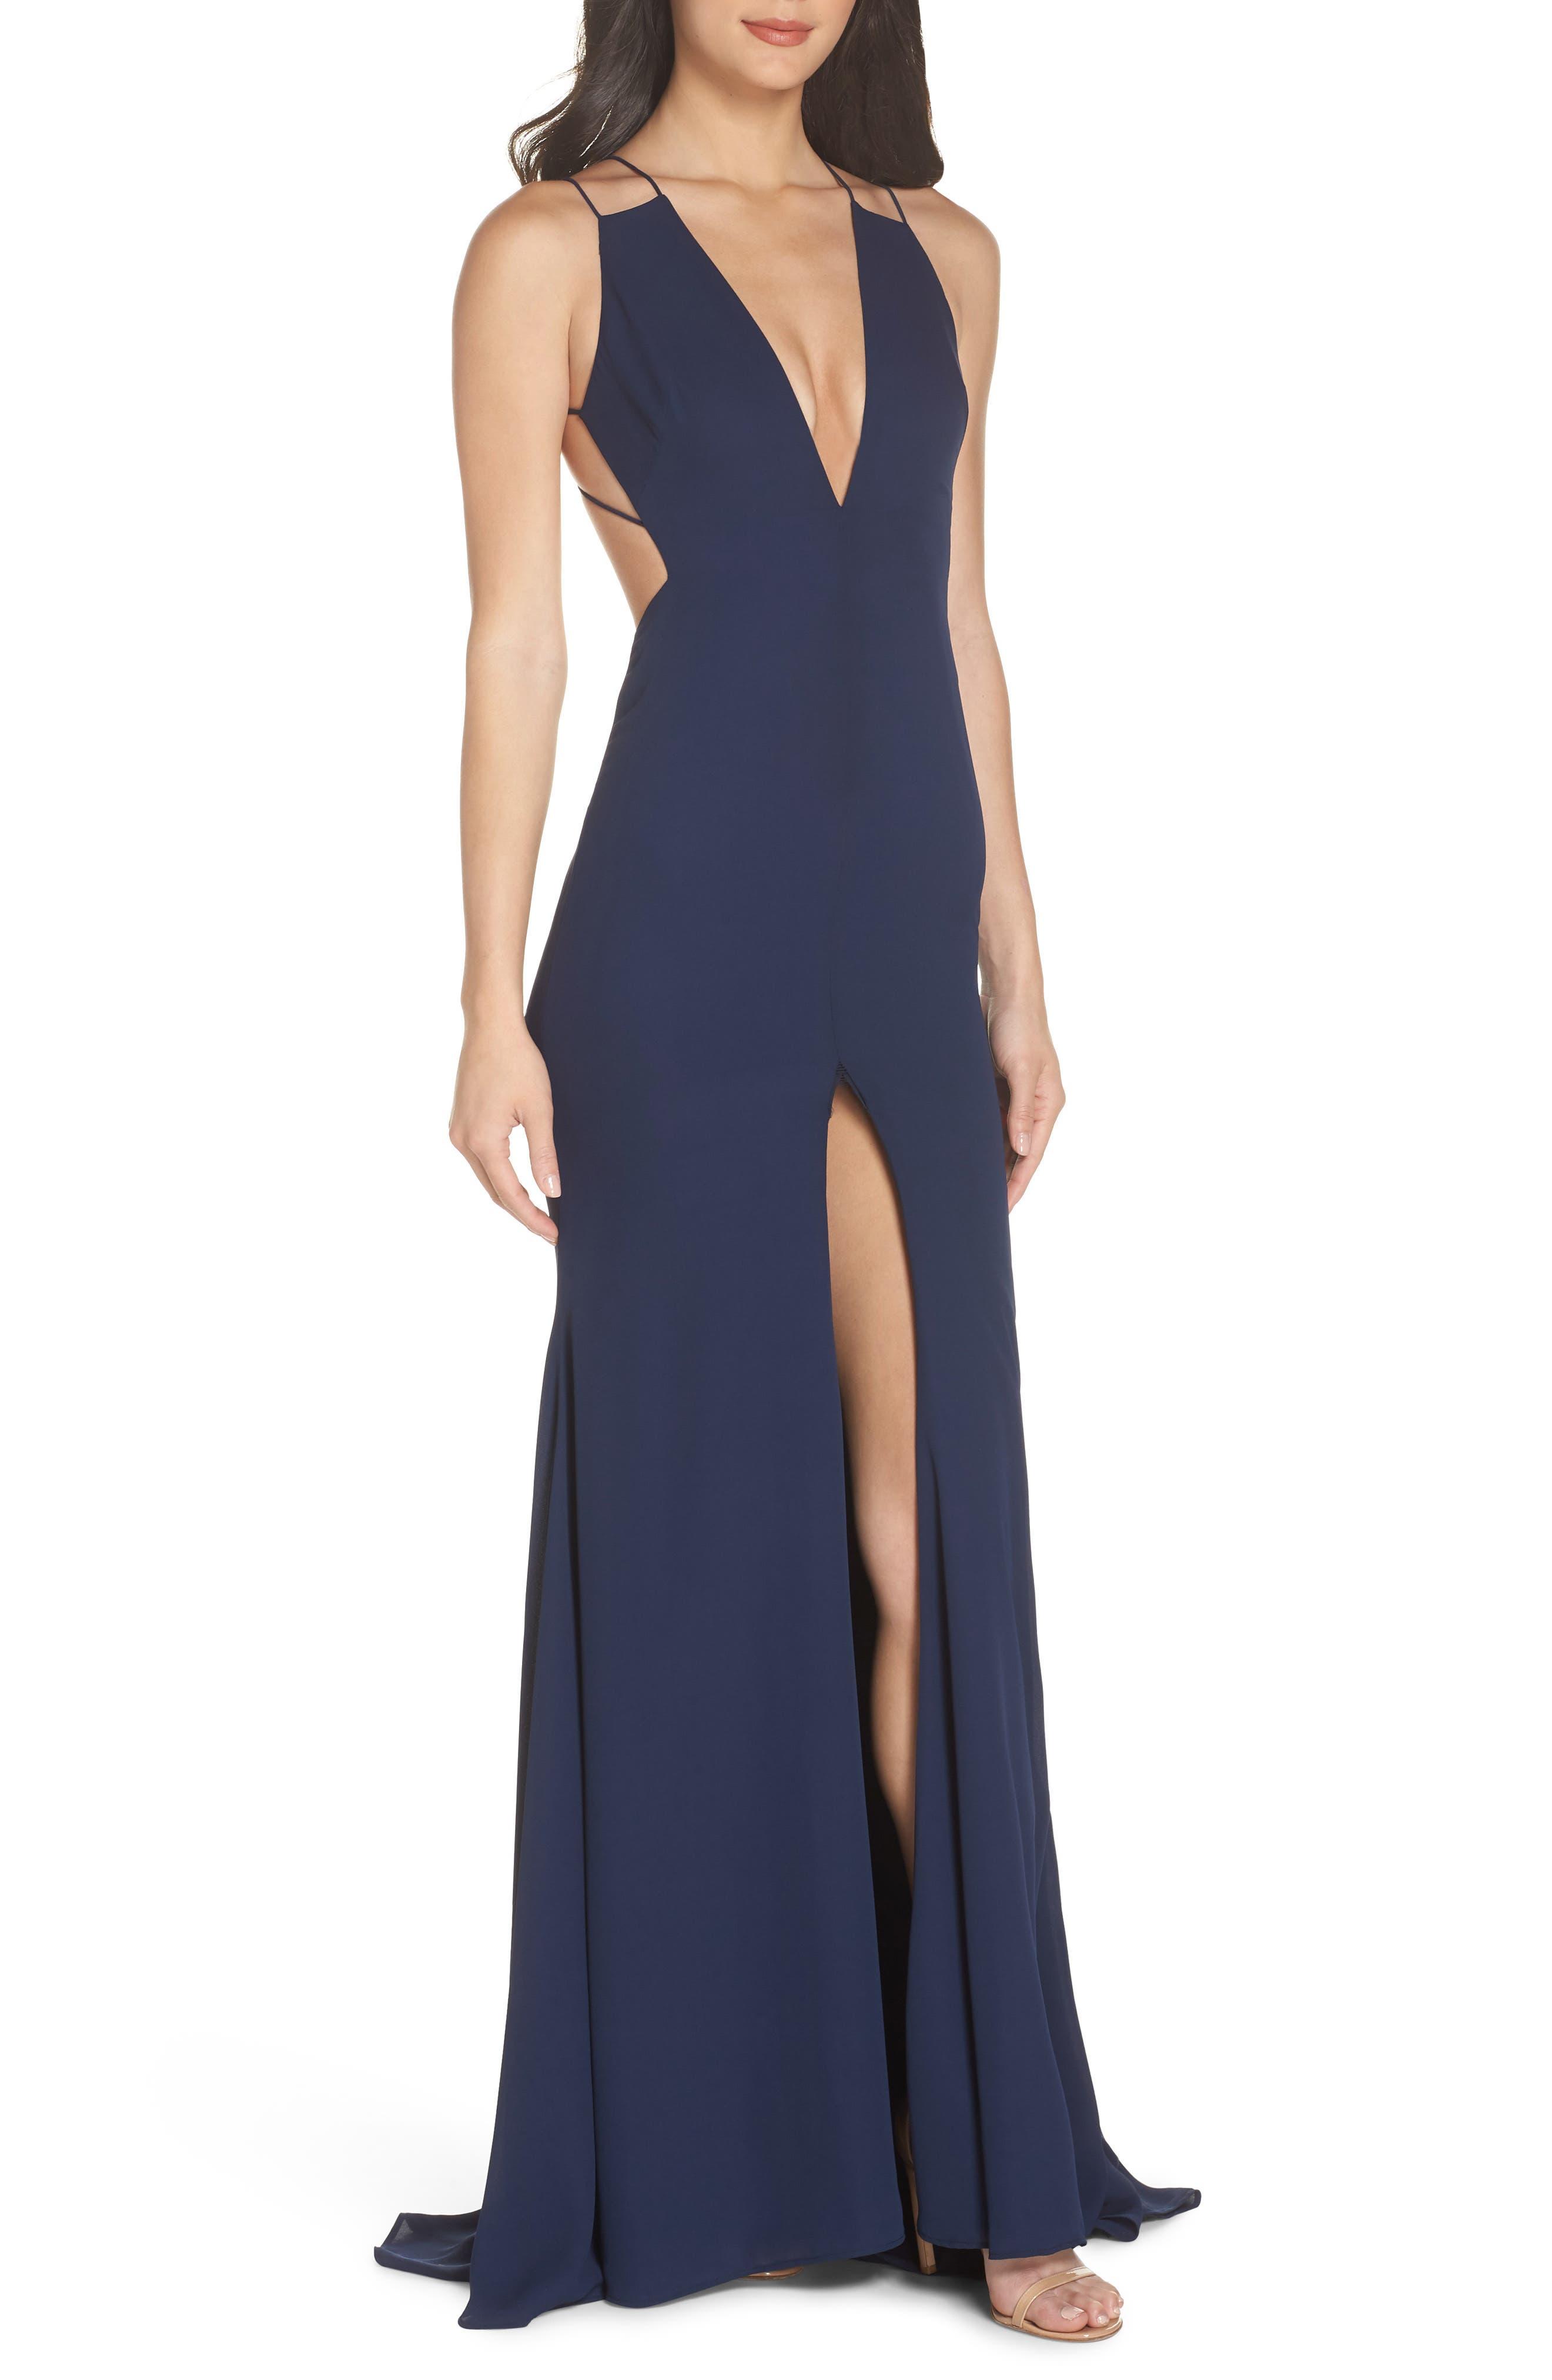 2018 Prom Dresses Peaches Boutique